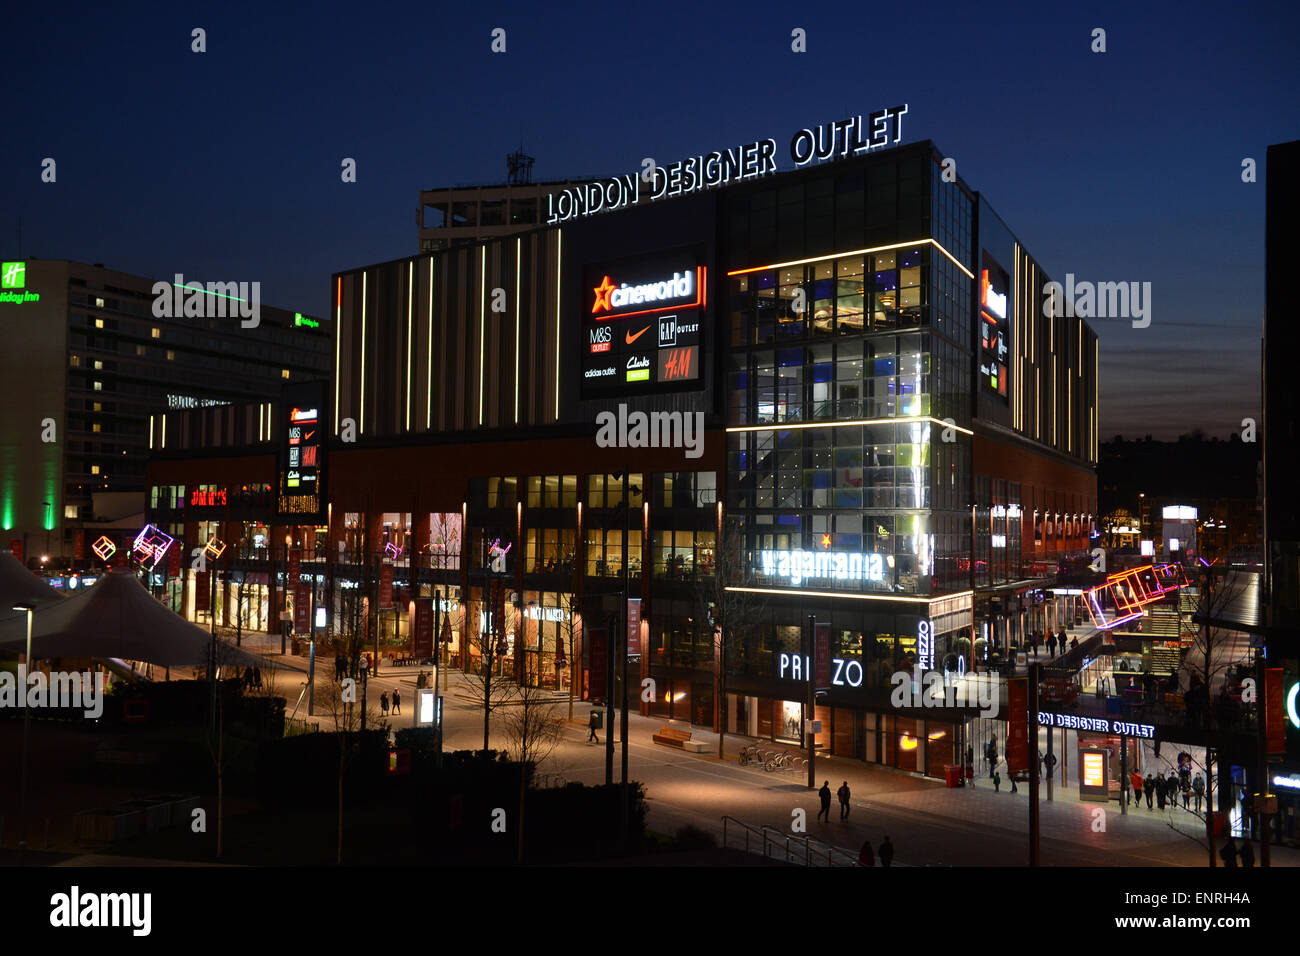 London Designer Outlet at Wembley Park Boulevard illuminated shops at night - Stock Image